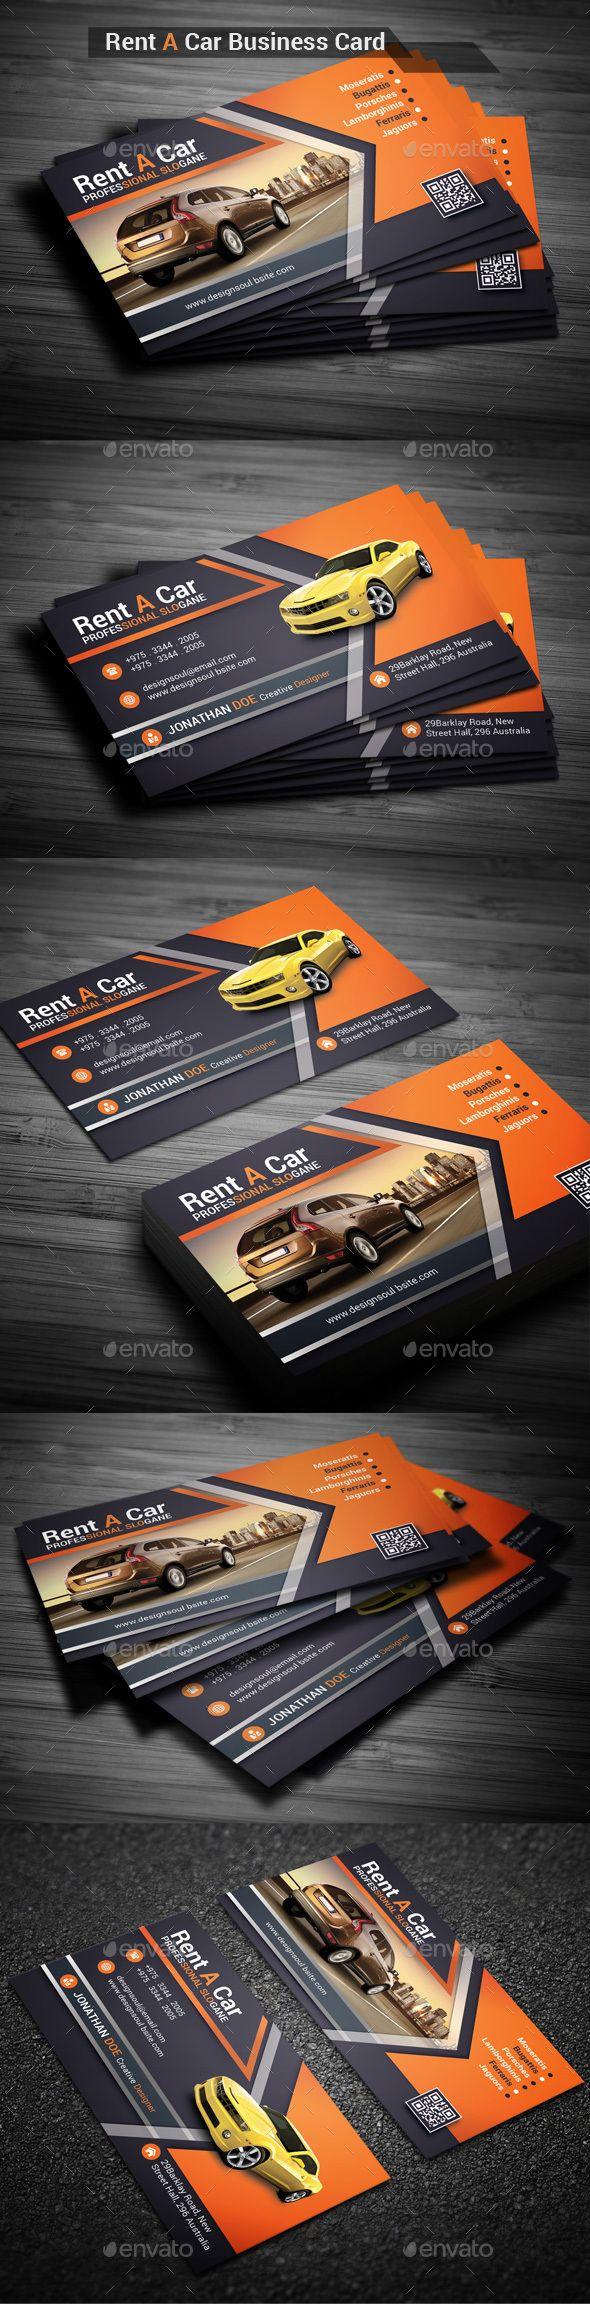 Rent a car business card cartes de visita visita e carto rent a car business card reheart Gallery